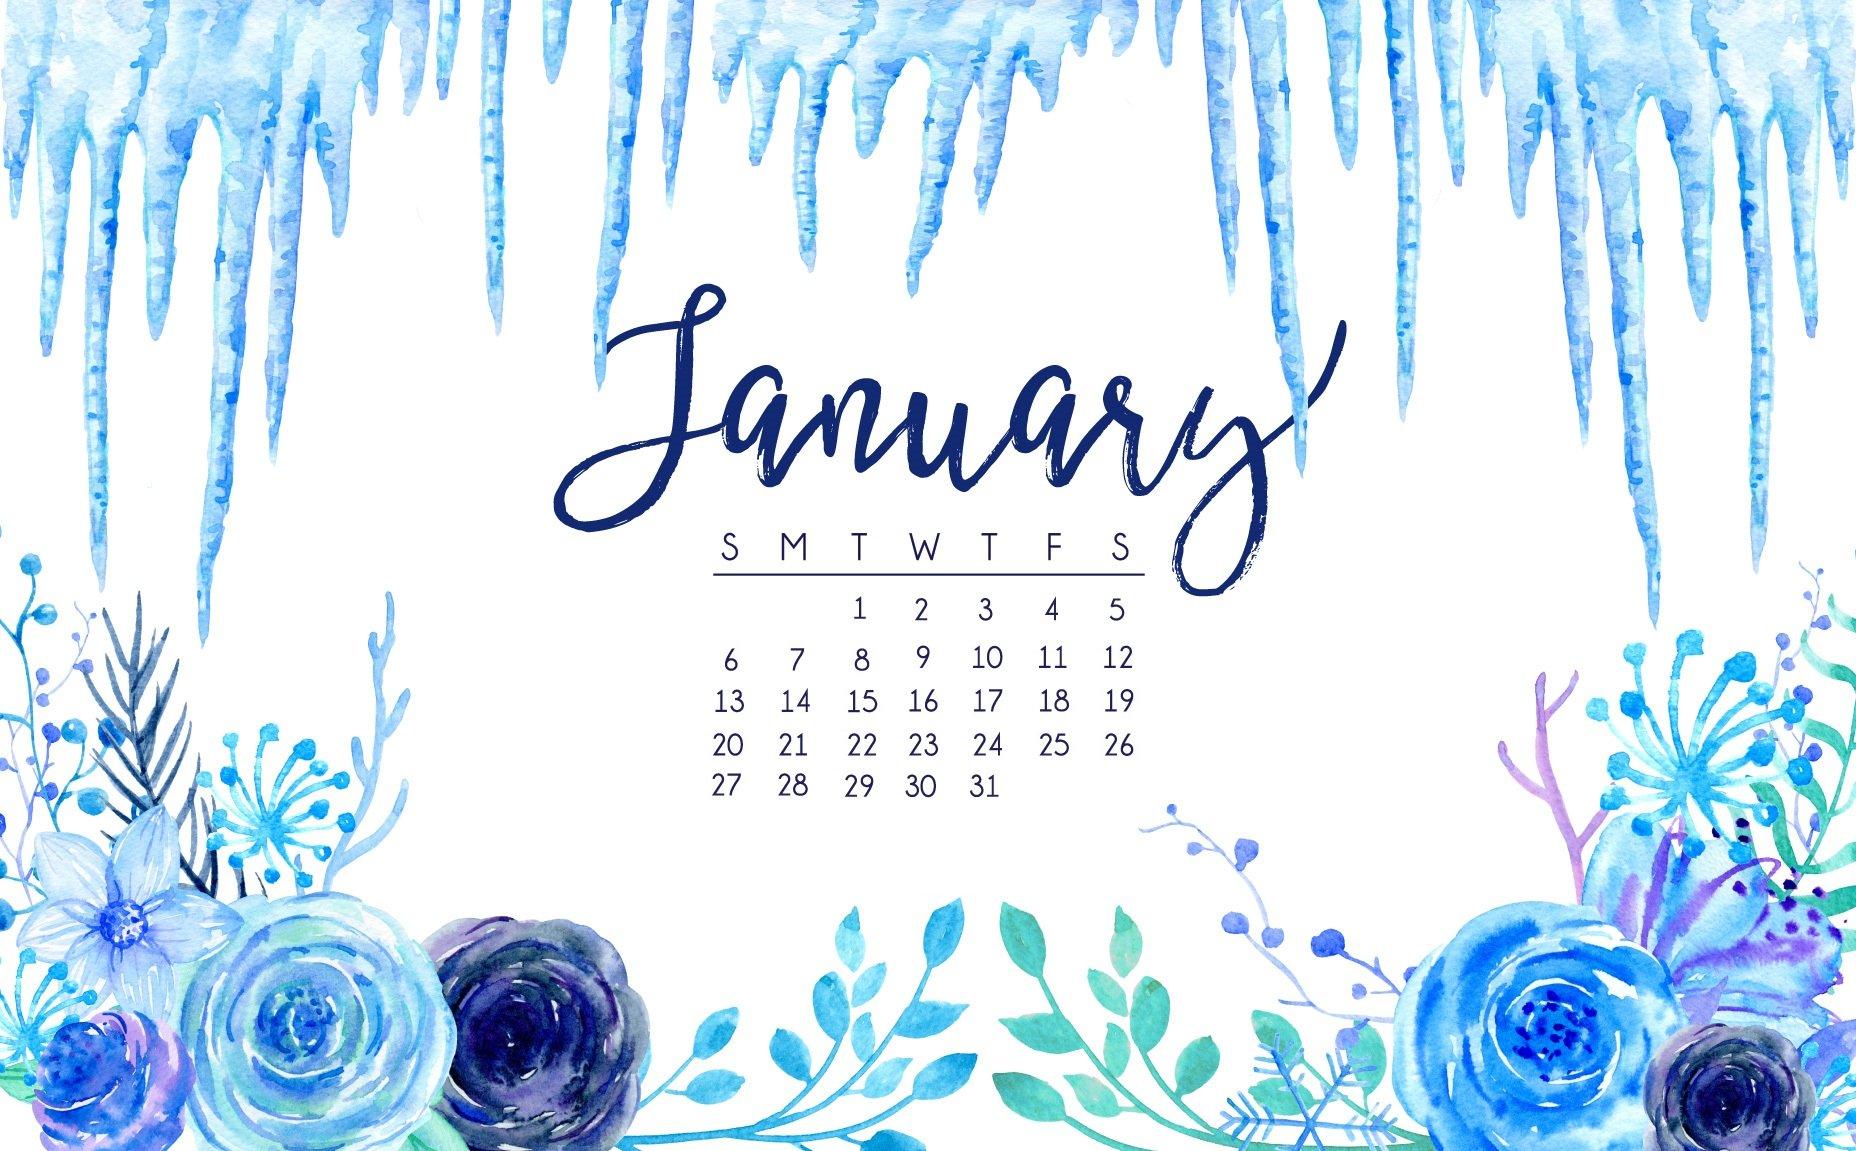 January 2019 HD Calendar Wallpapers Latest Calendar 1856x1151